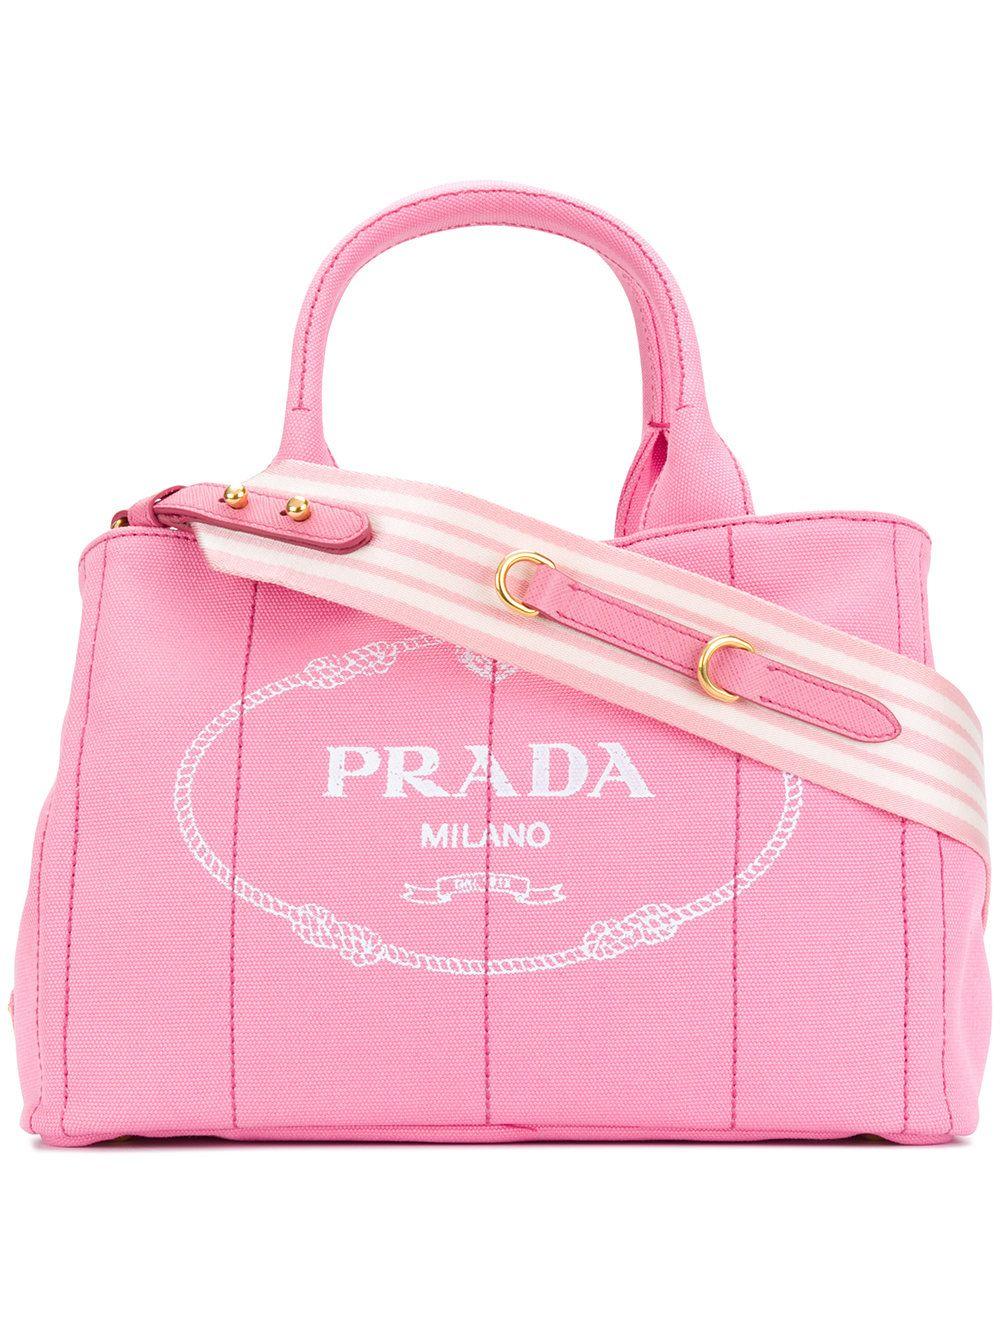 c7719764ce79 Prada Giardiniera Tote Bag   Dream dresses   Pinterest